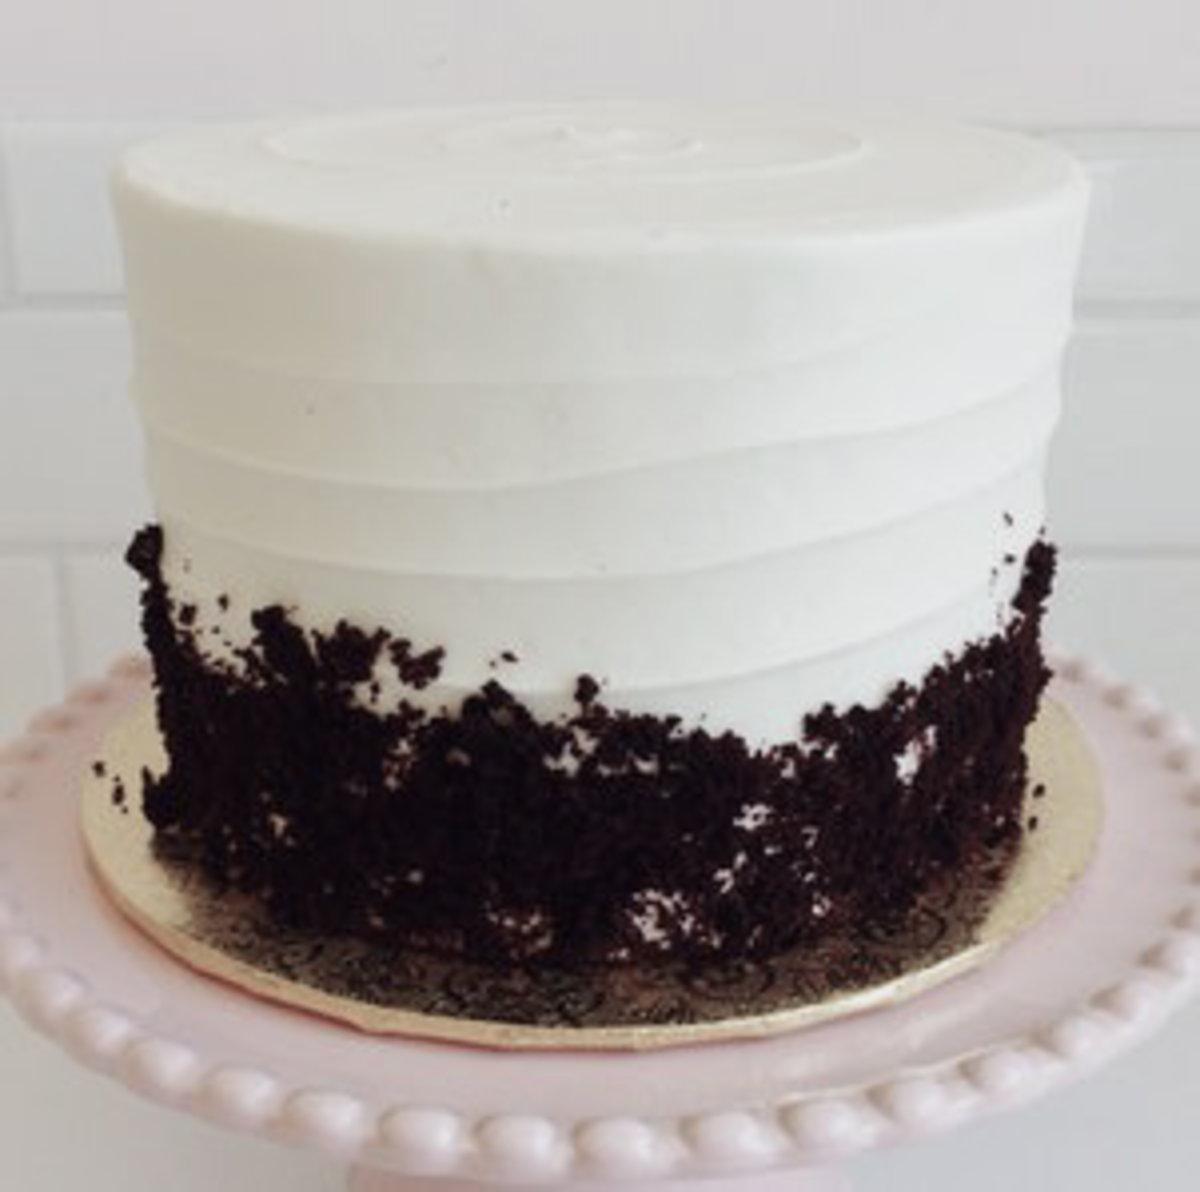 Dark Chocolate and Vanilla Bean Cake Swirled Together for the Perfect